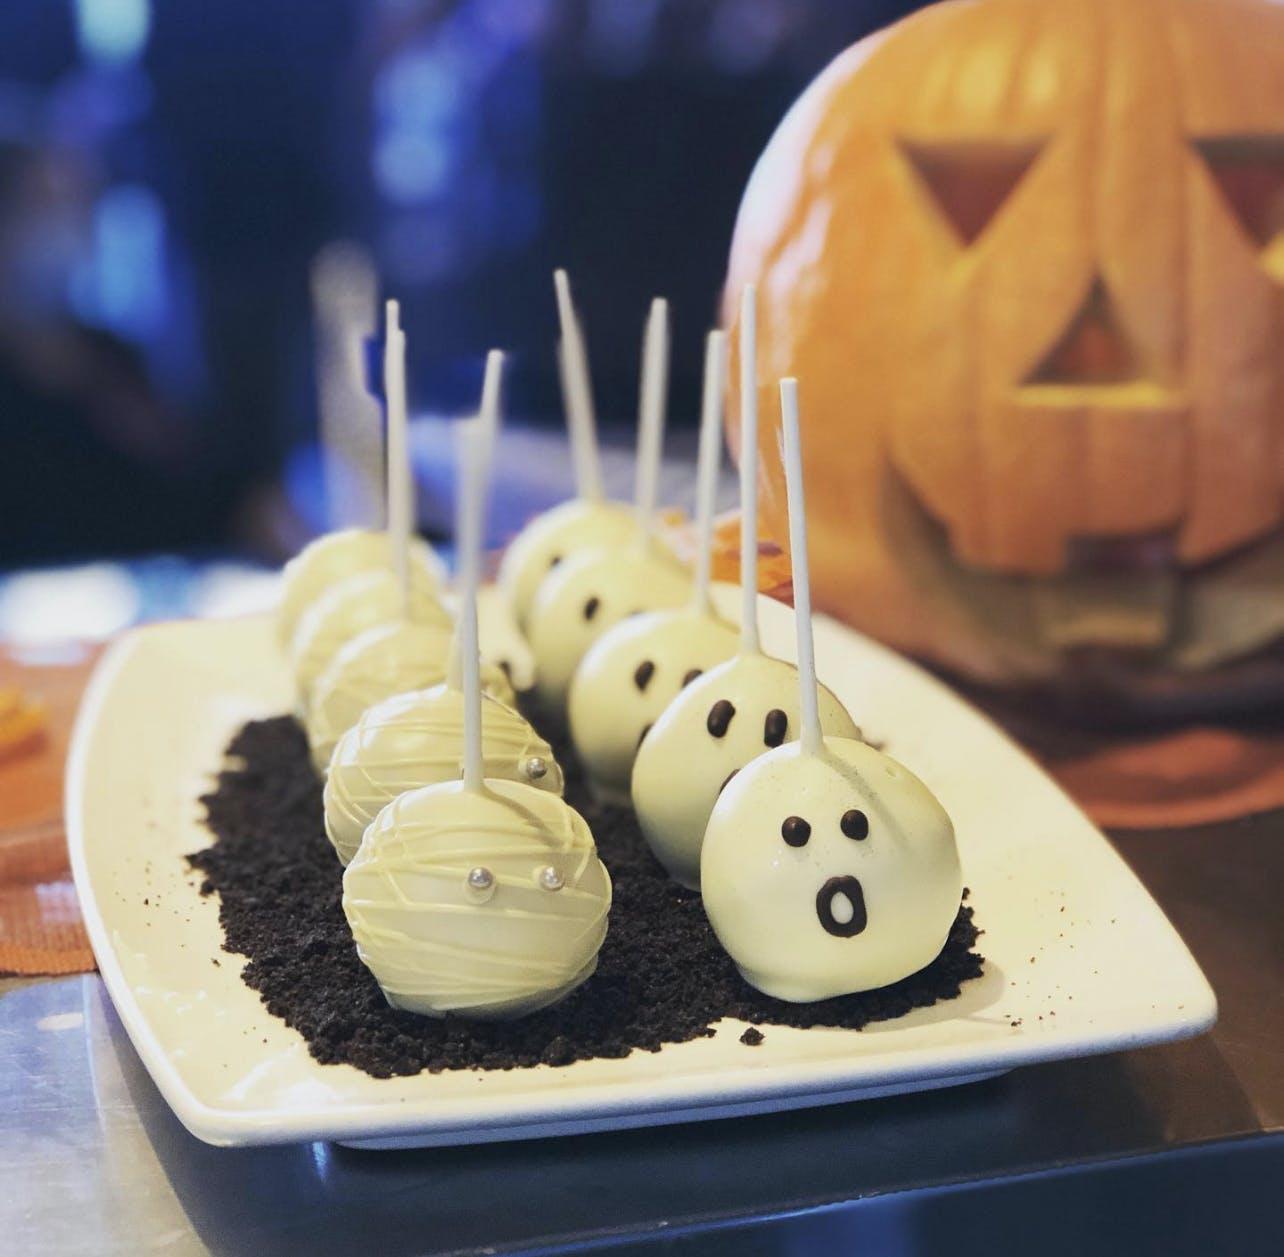 a birthday cake on a table